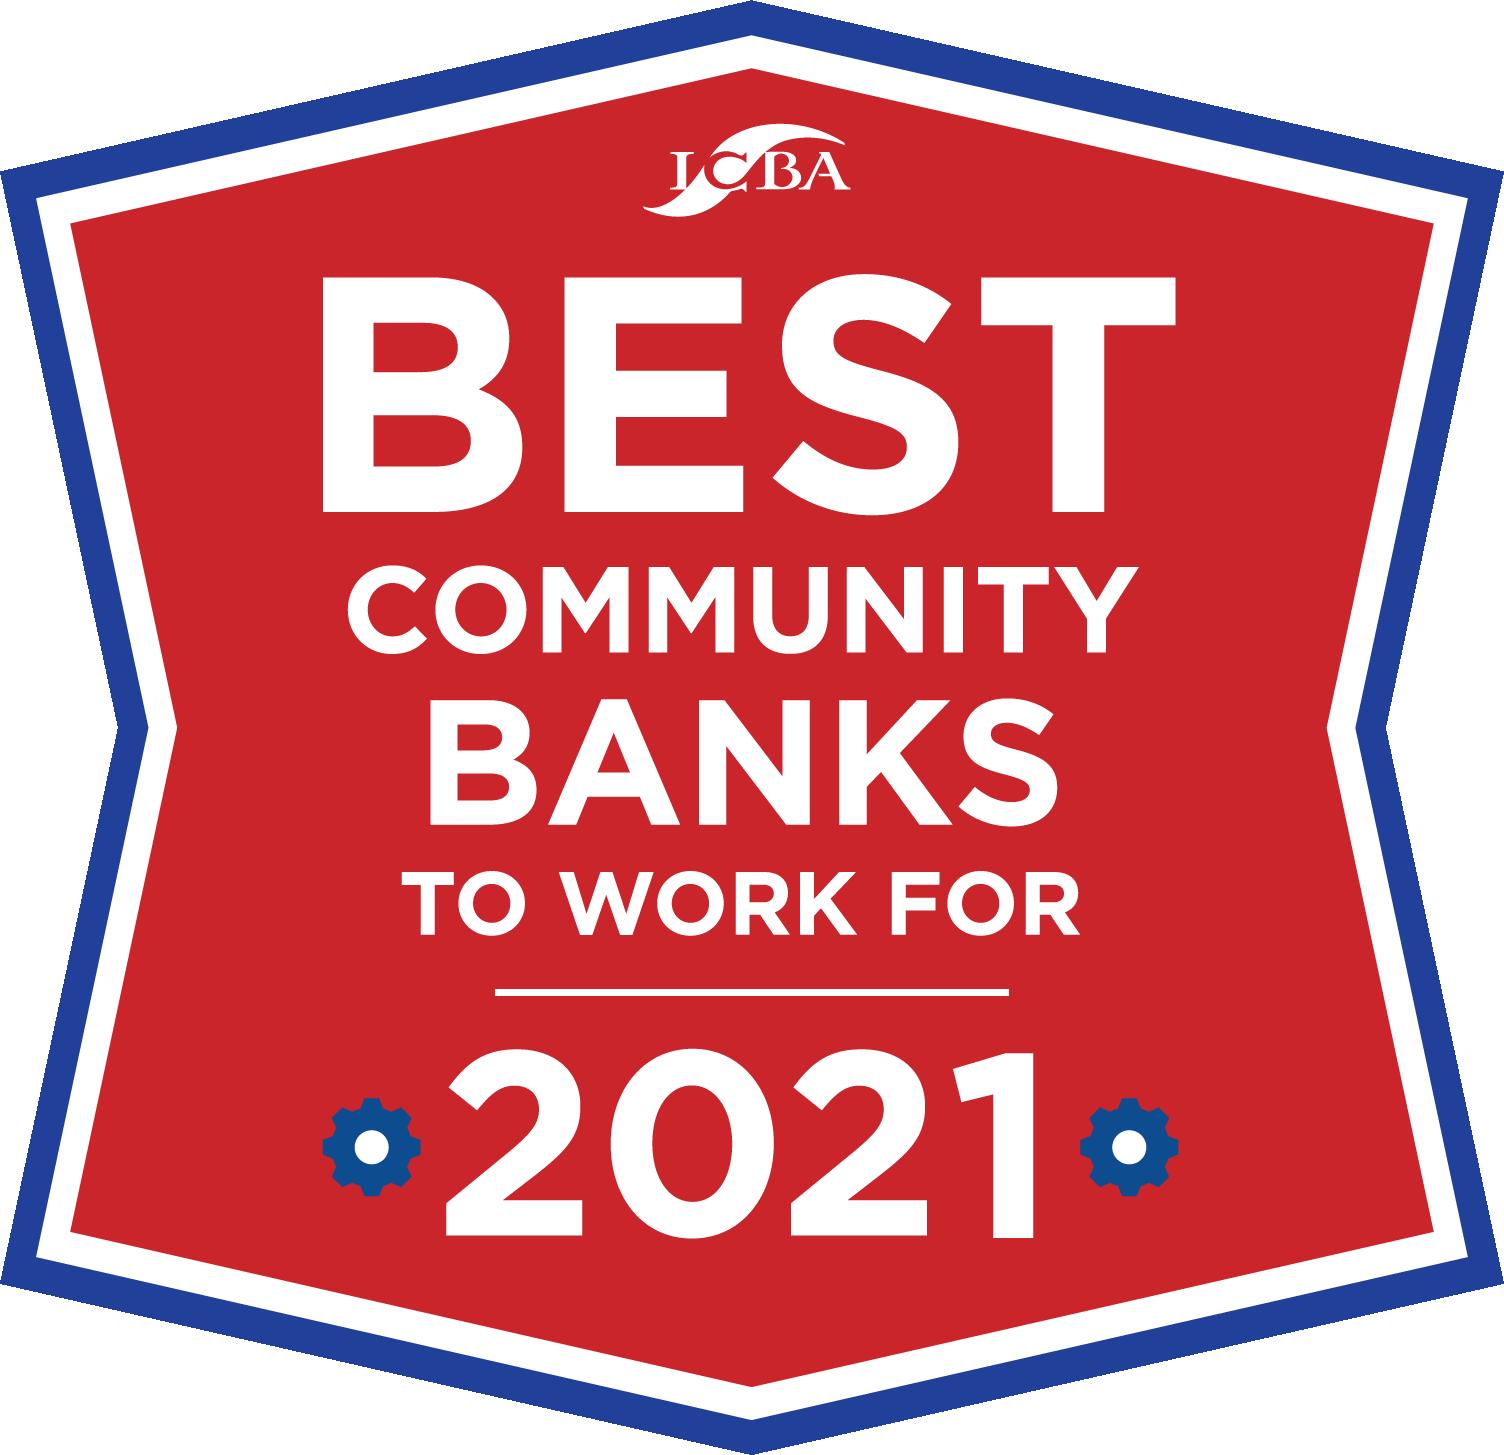 Best Community Banks 2021